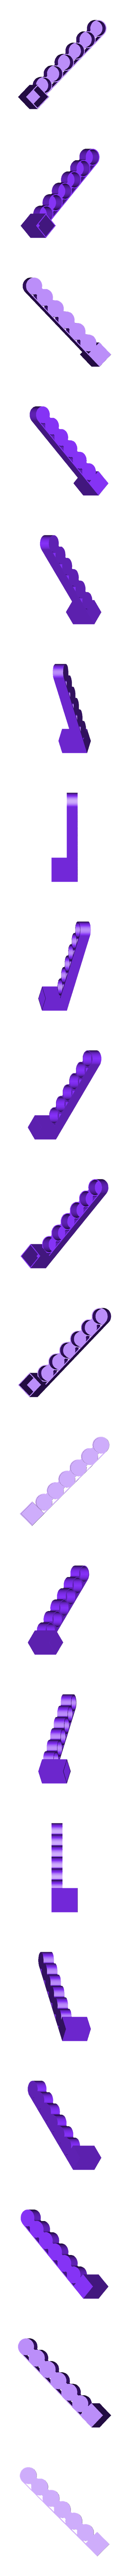 Paint_holder.stl Download free STL file Paint Bottle Brush Holder with Super Glue and Tube Glue attachments • 3D print model, Mrdwgraf